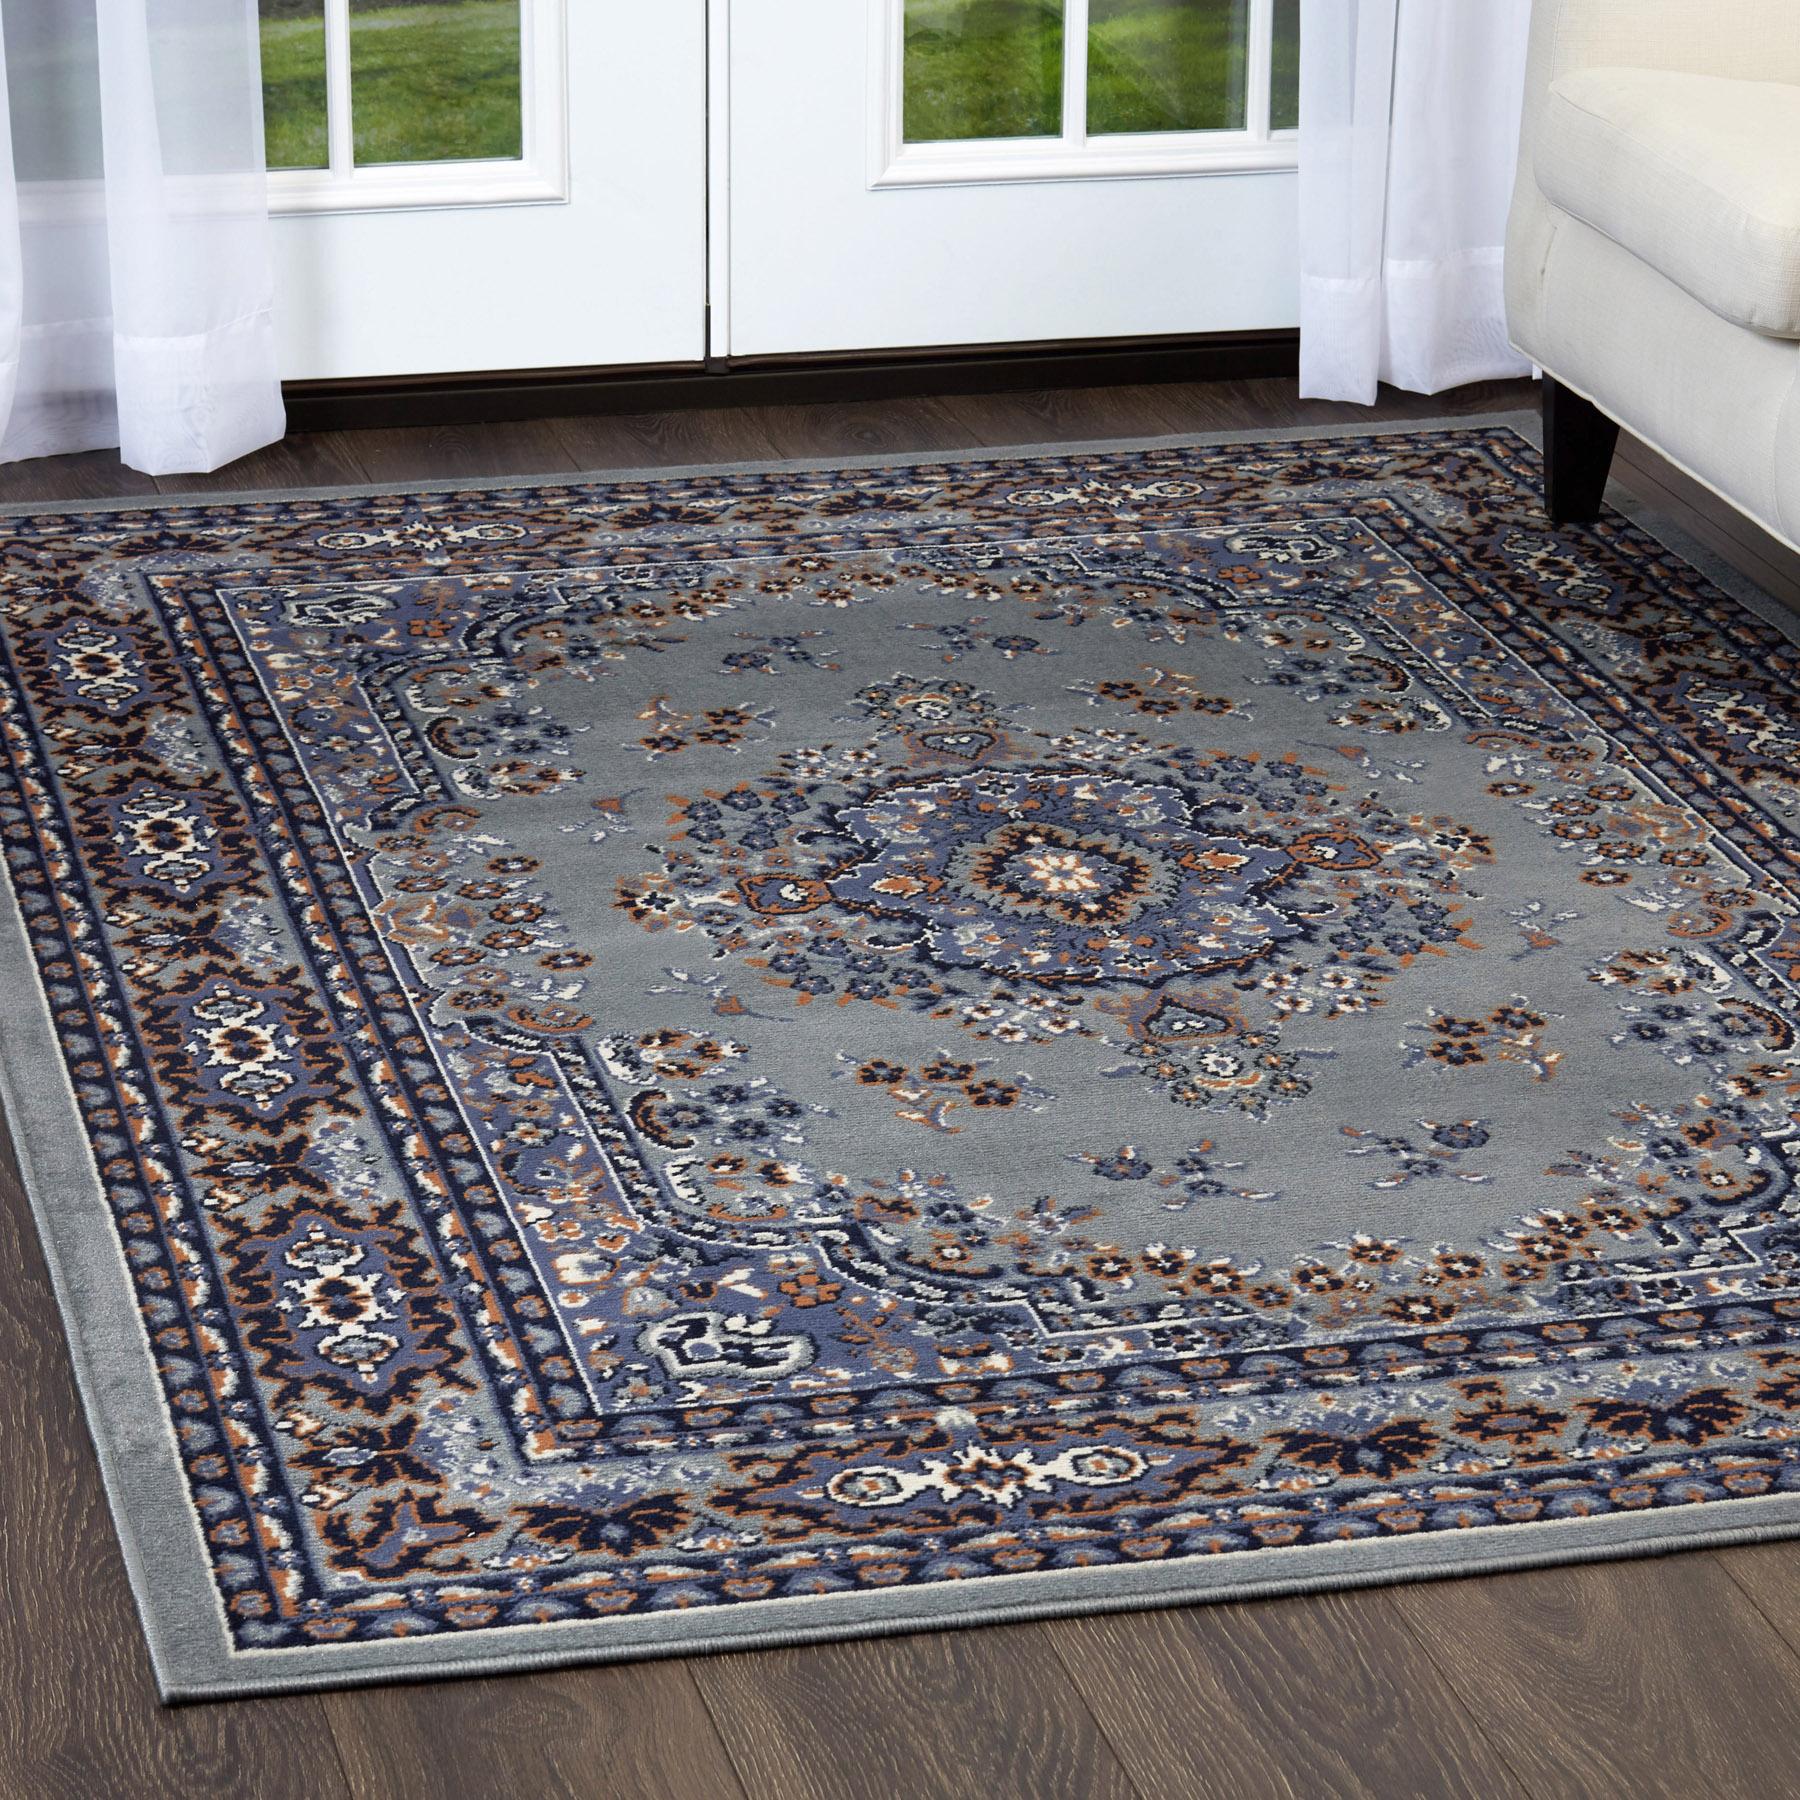 Details About Persien Silver Area Rug Runner 2 X 8 Oriental Carpet 69 Actual 1 10 X 7 3